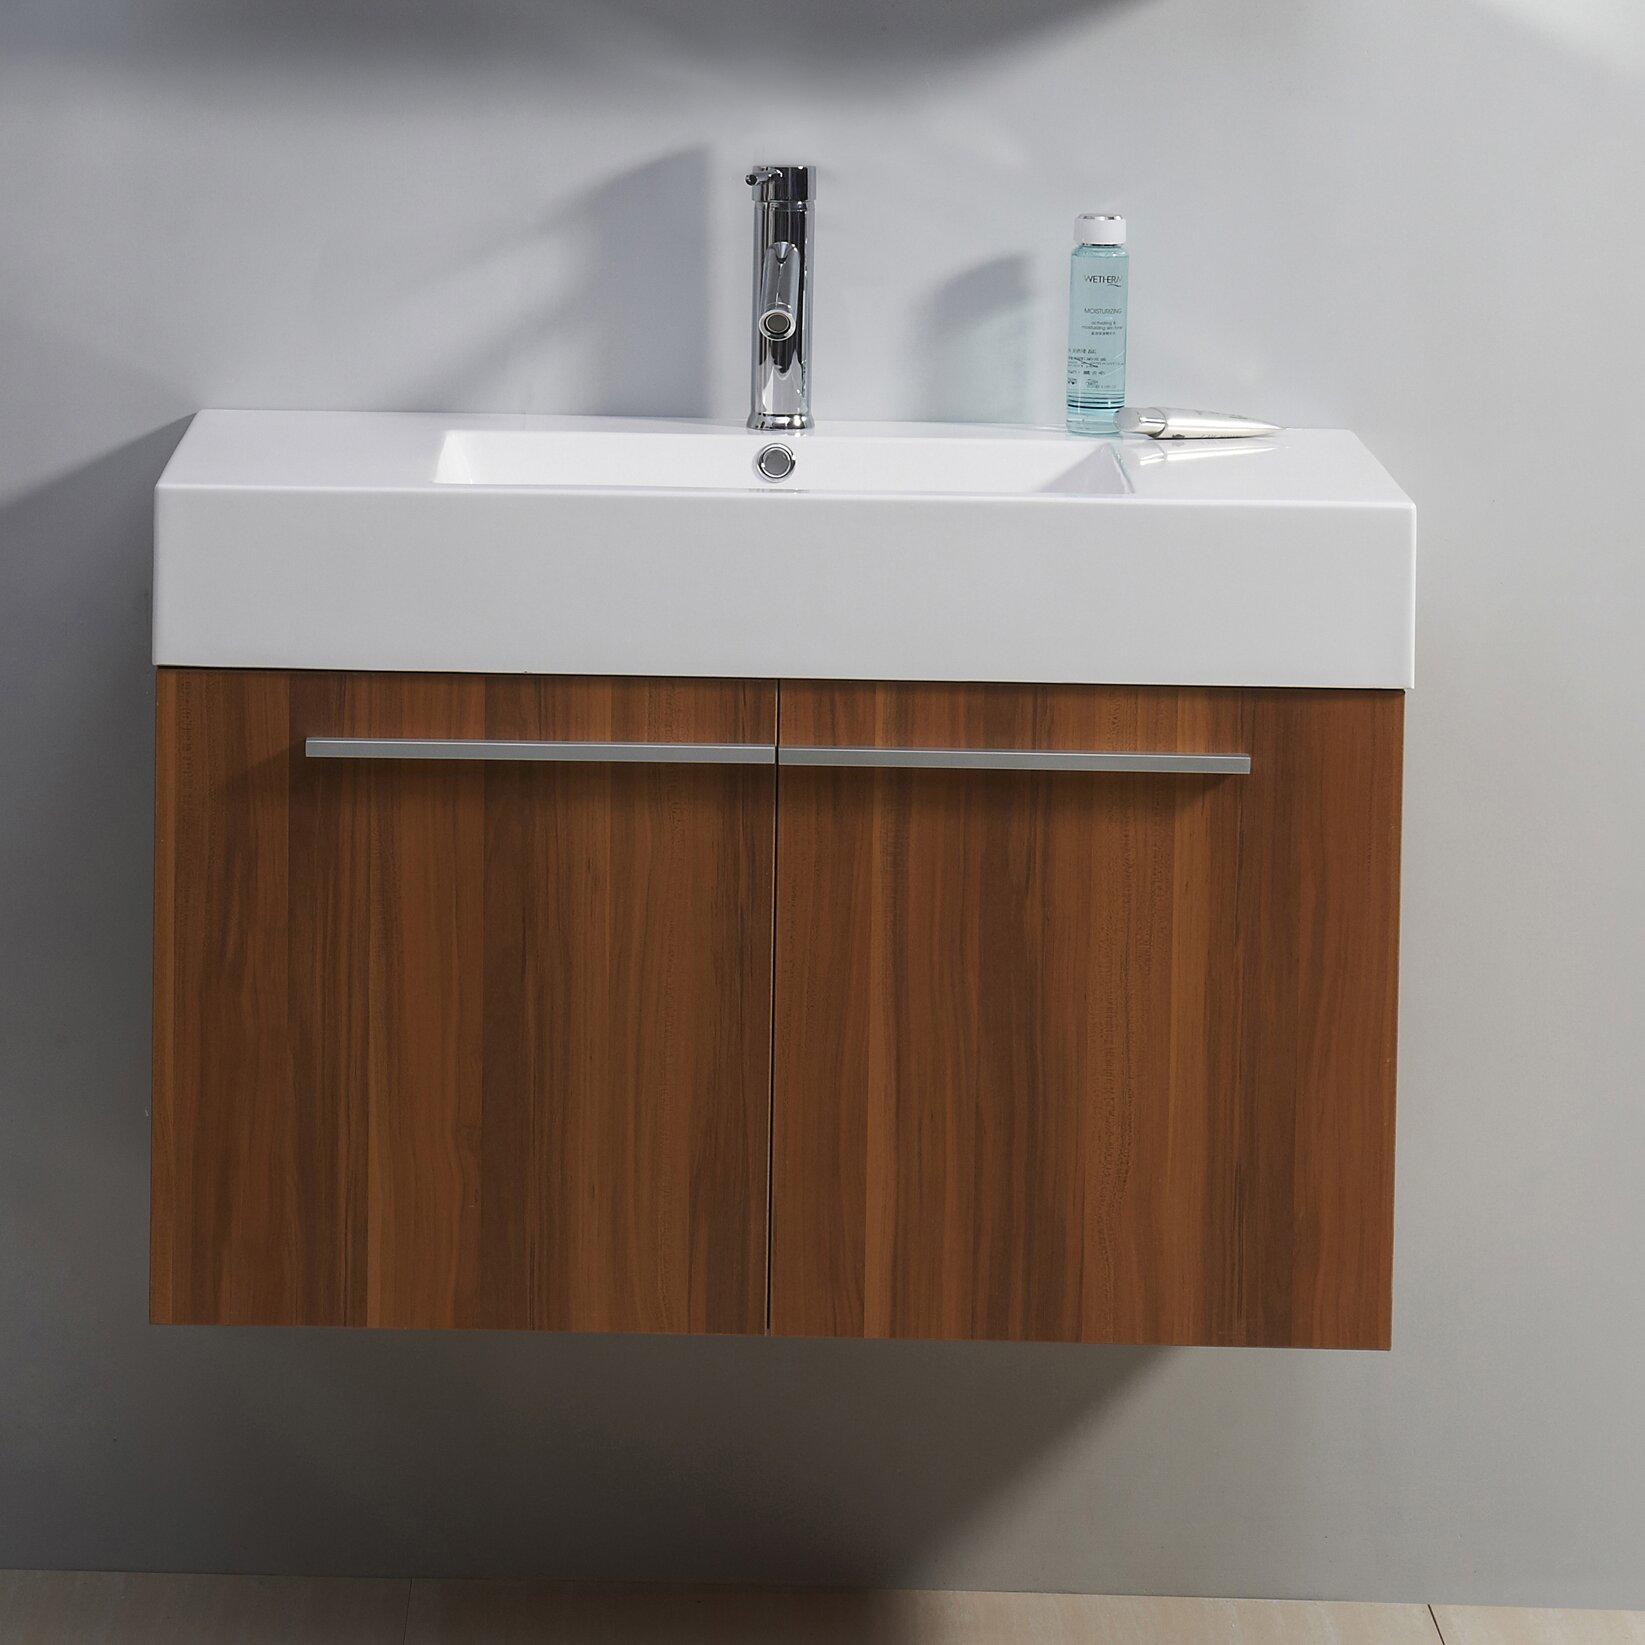 "Brayden Studio Frausto 36"" Single Bathroom Vanity Set"